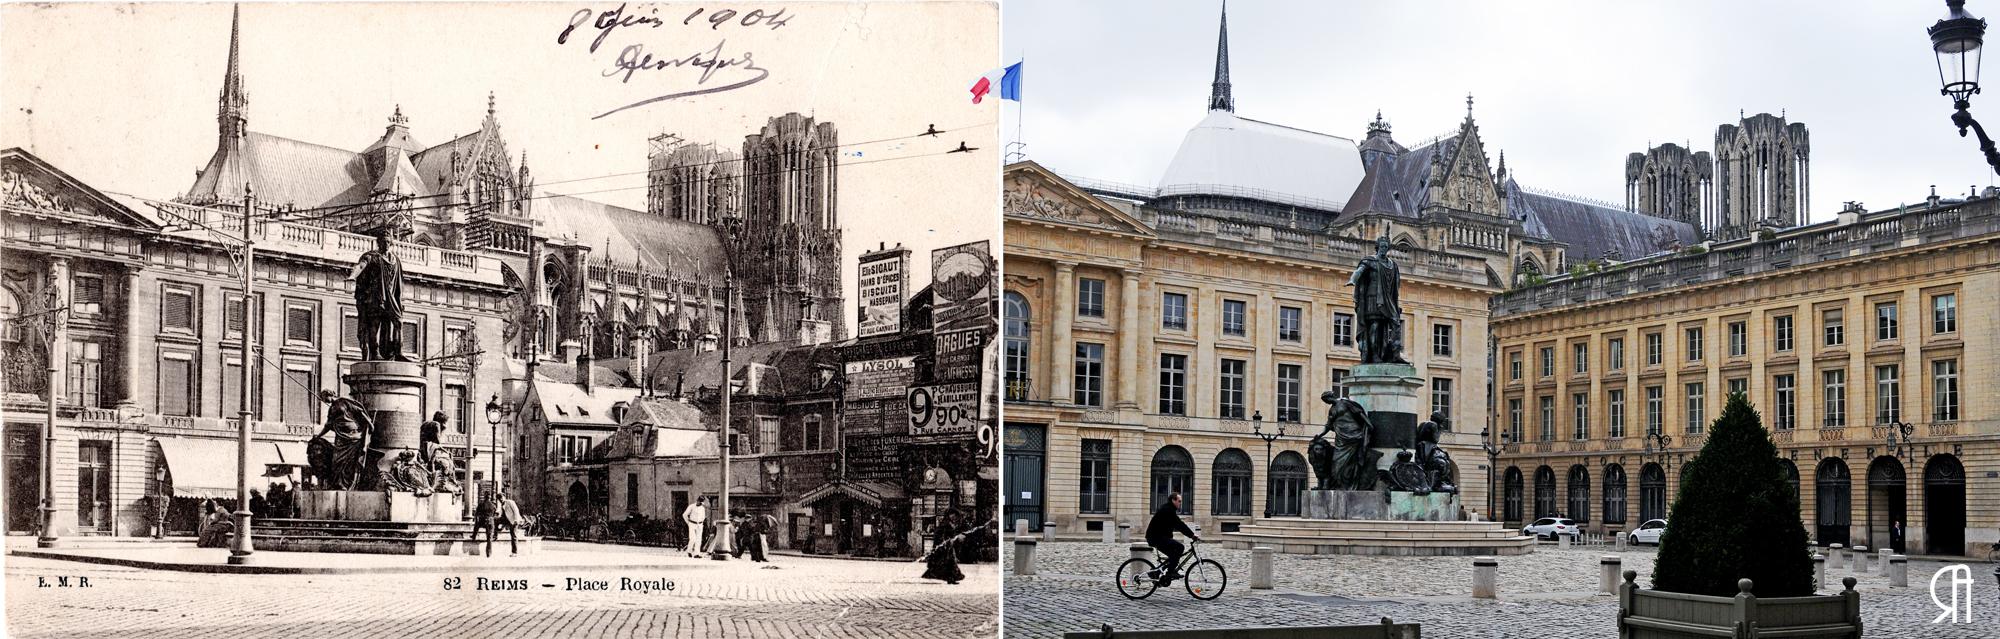 Place Royale vers 1904